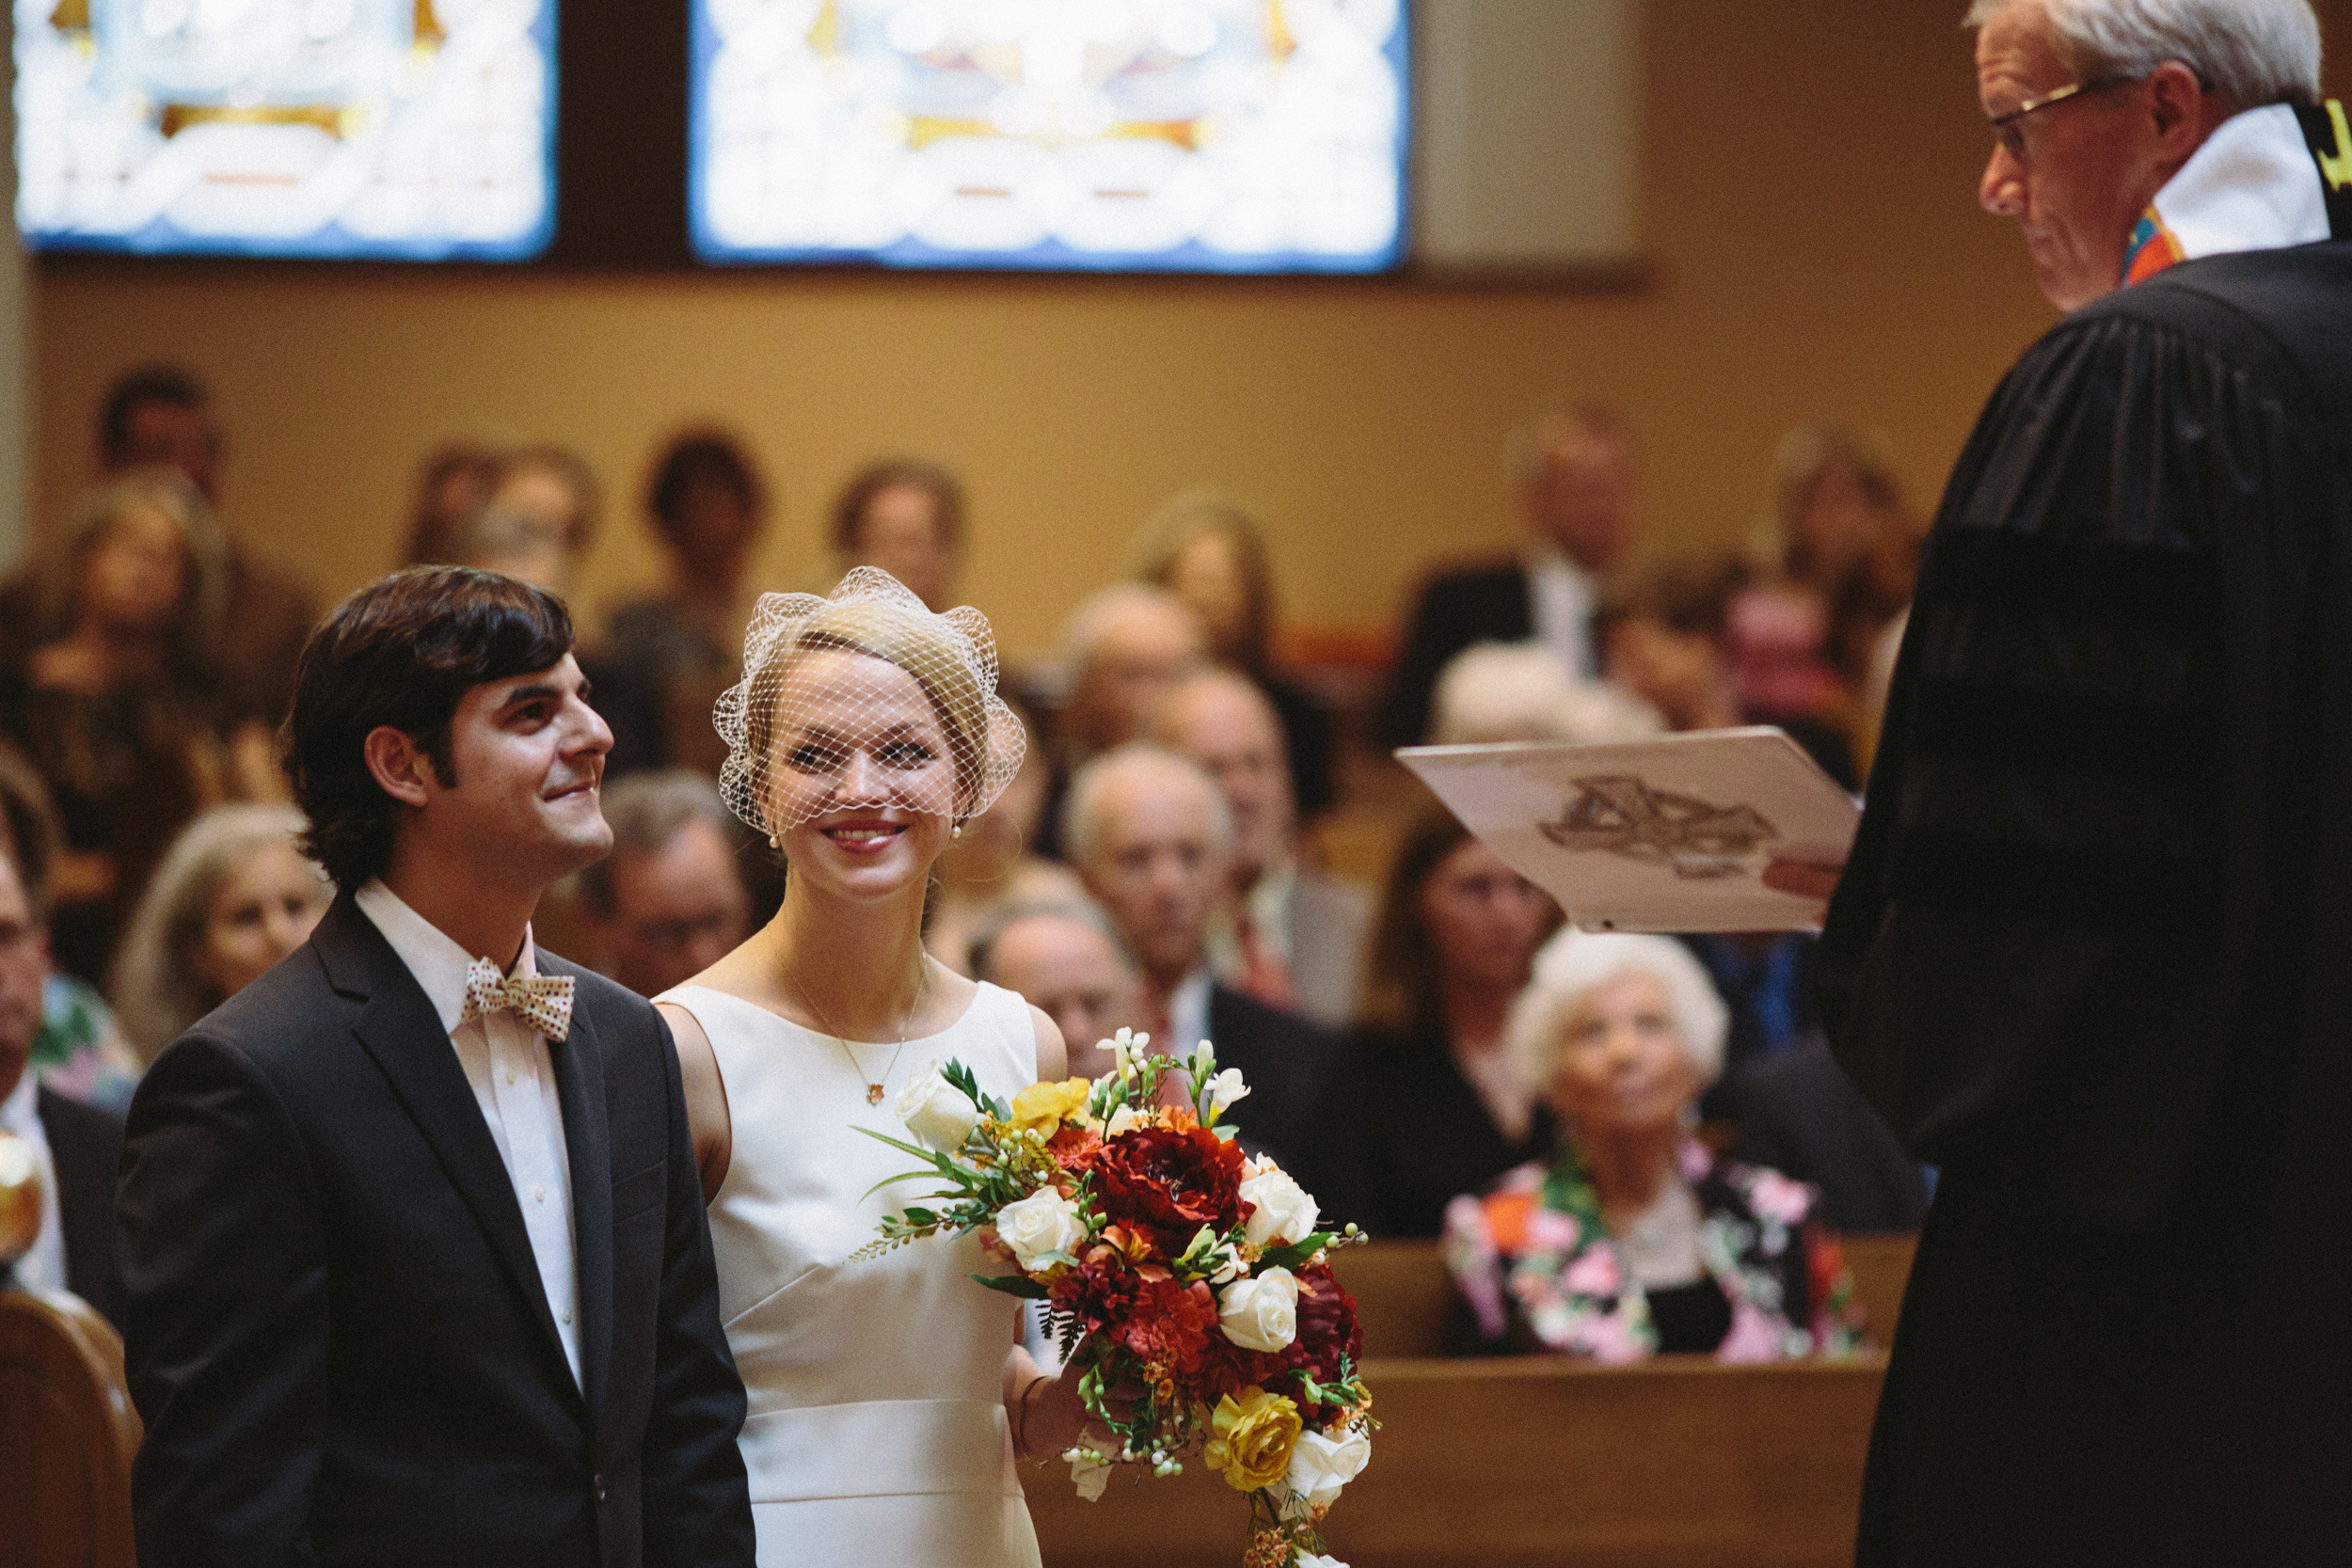 10-05-2013 maggie & adam wedding photography by brian milo-128.jpg